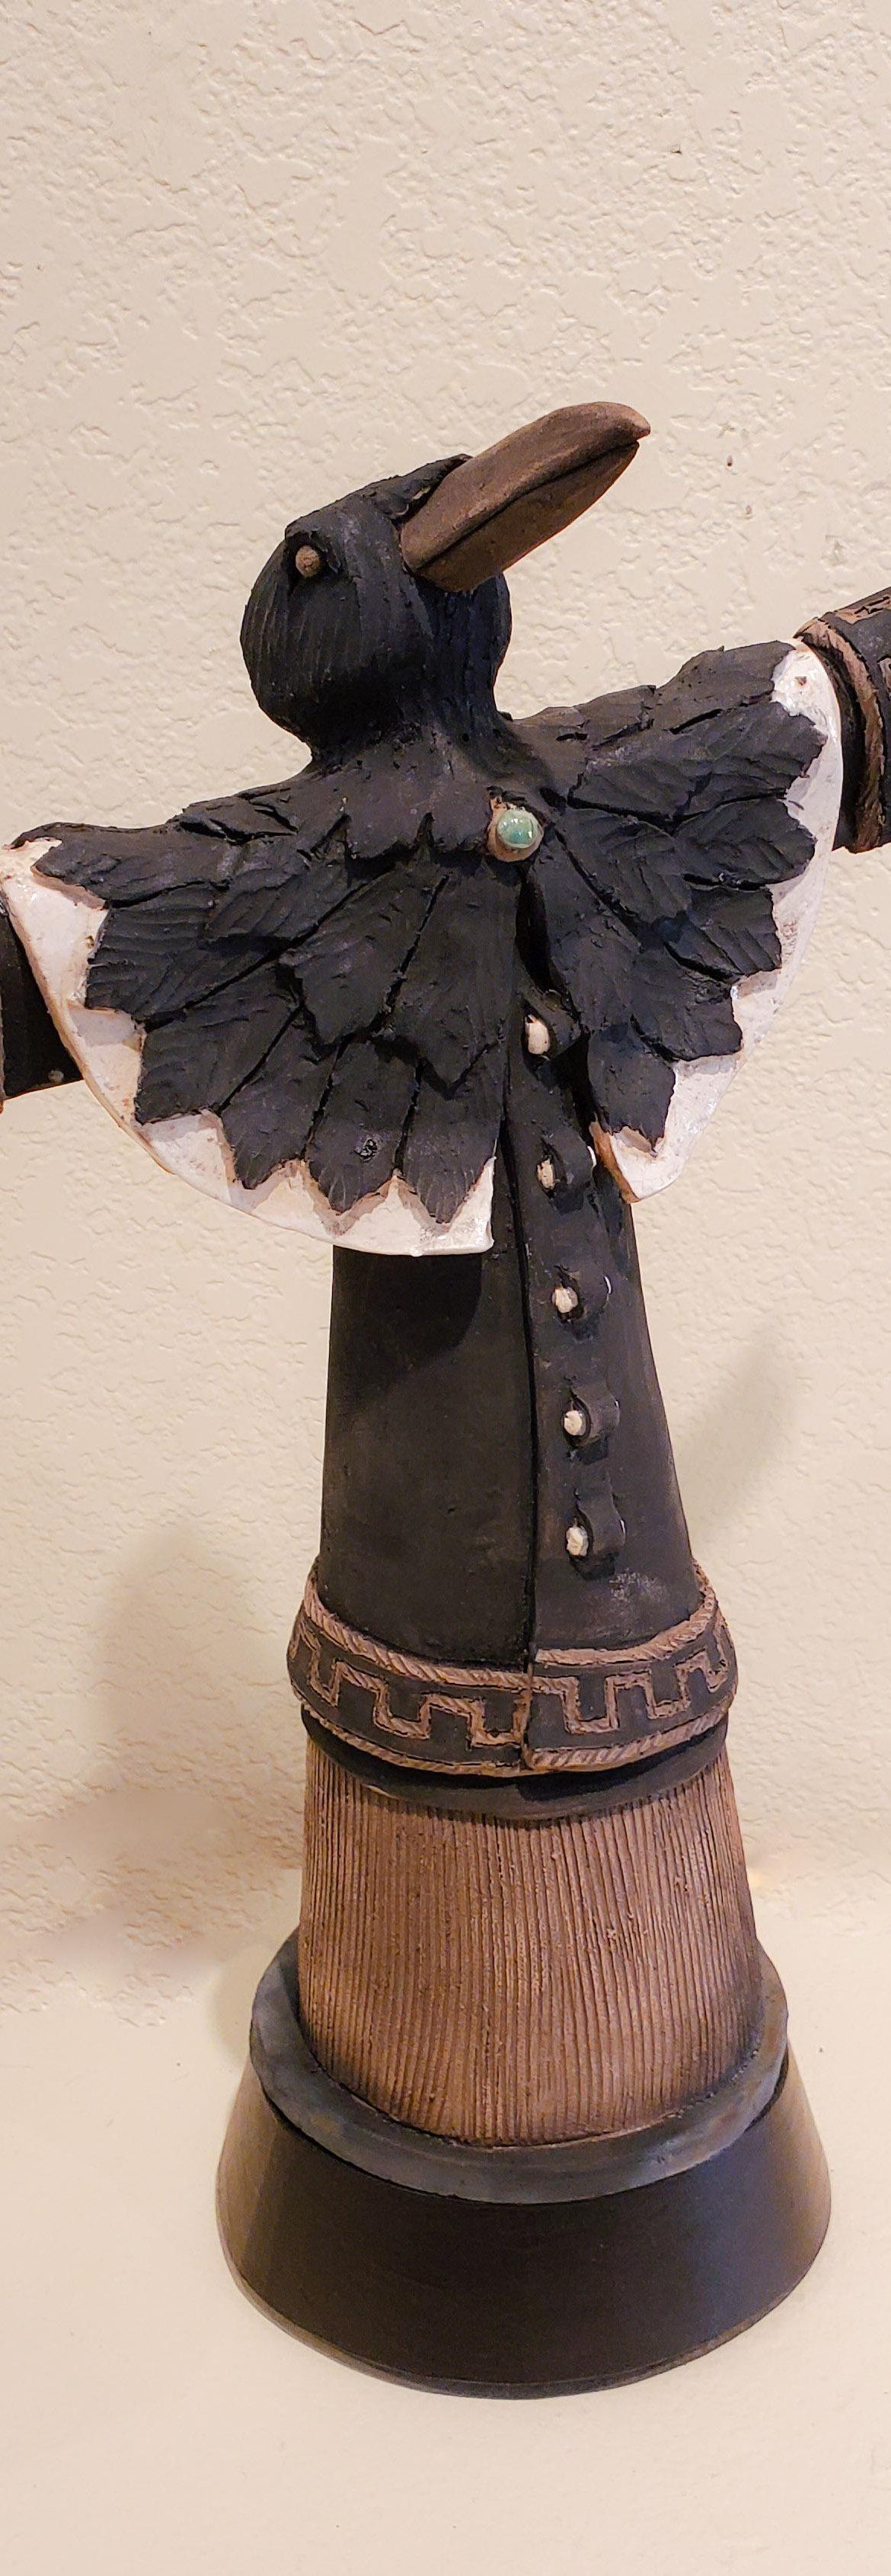 Dancing Raven #5, John Booth, Ceramic Sculpture, Rogoway Gallery